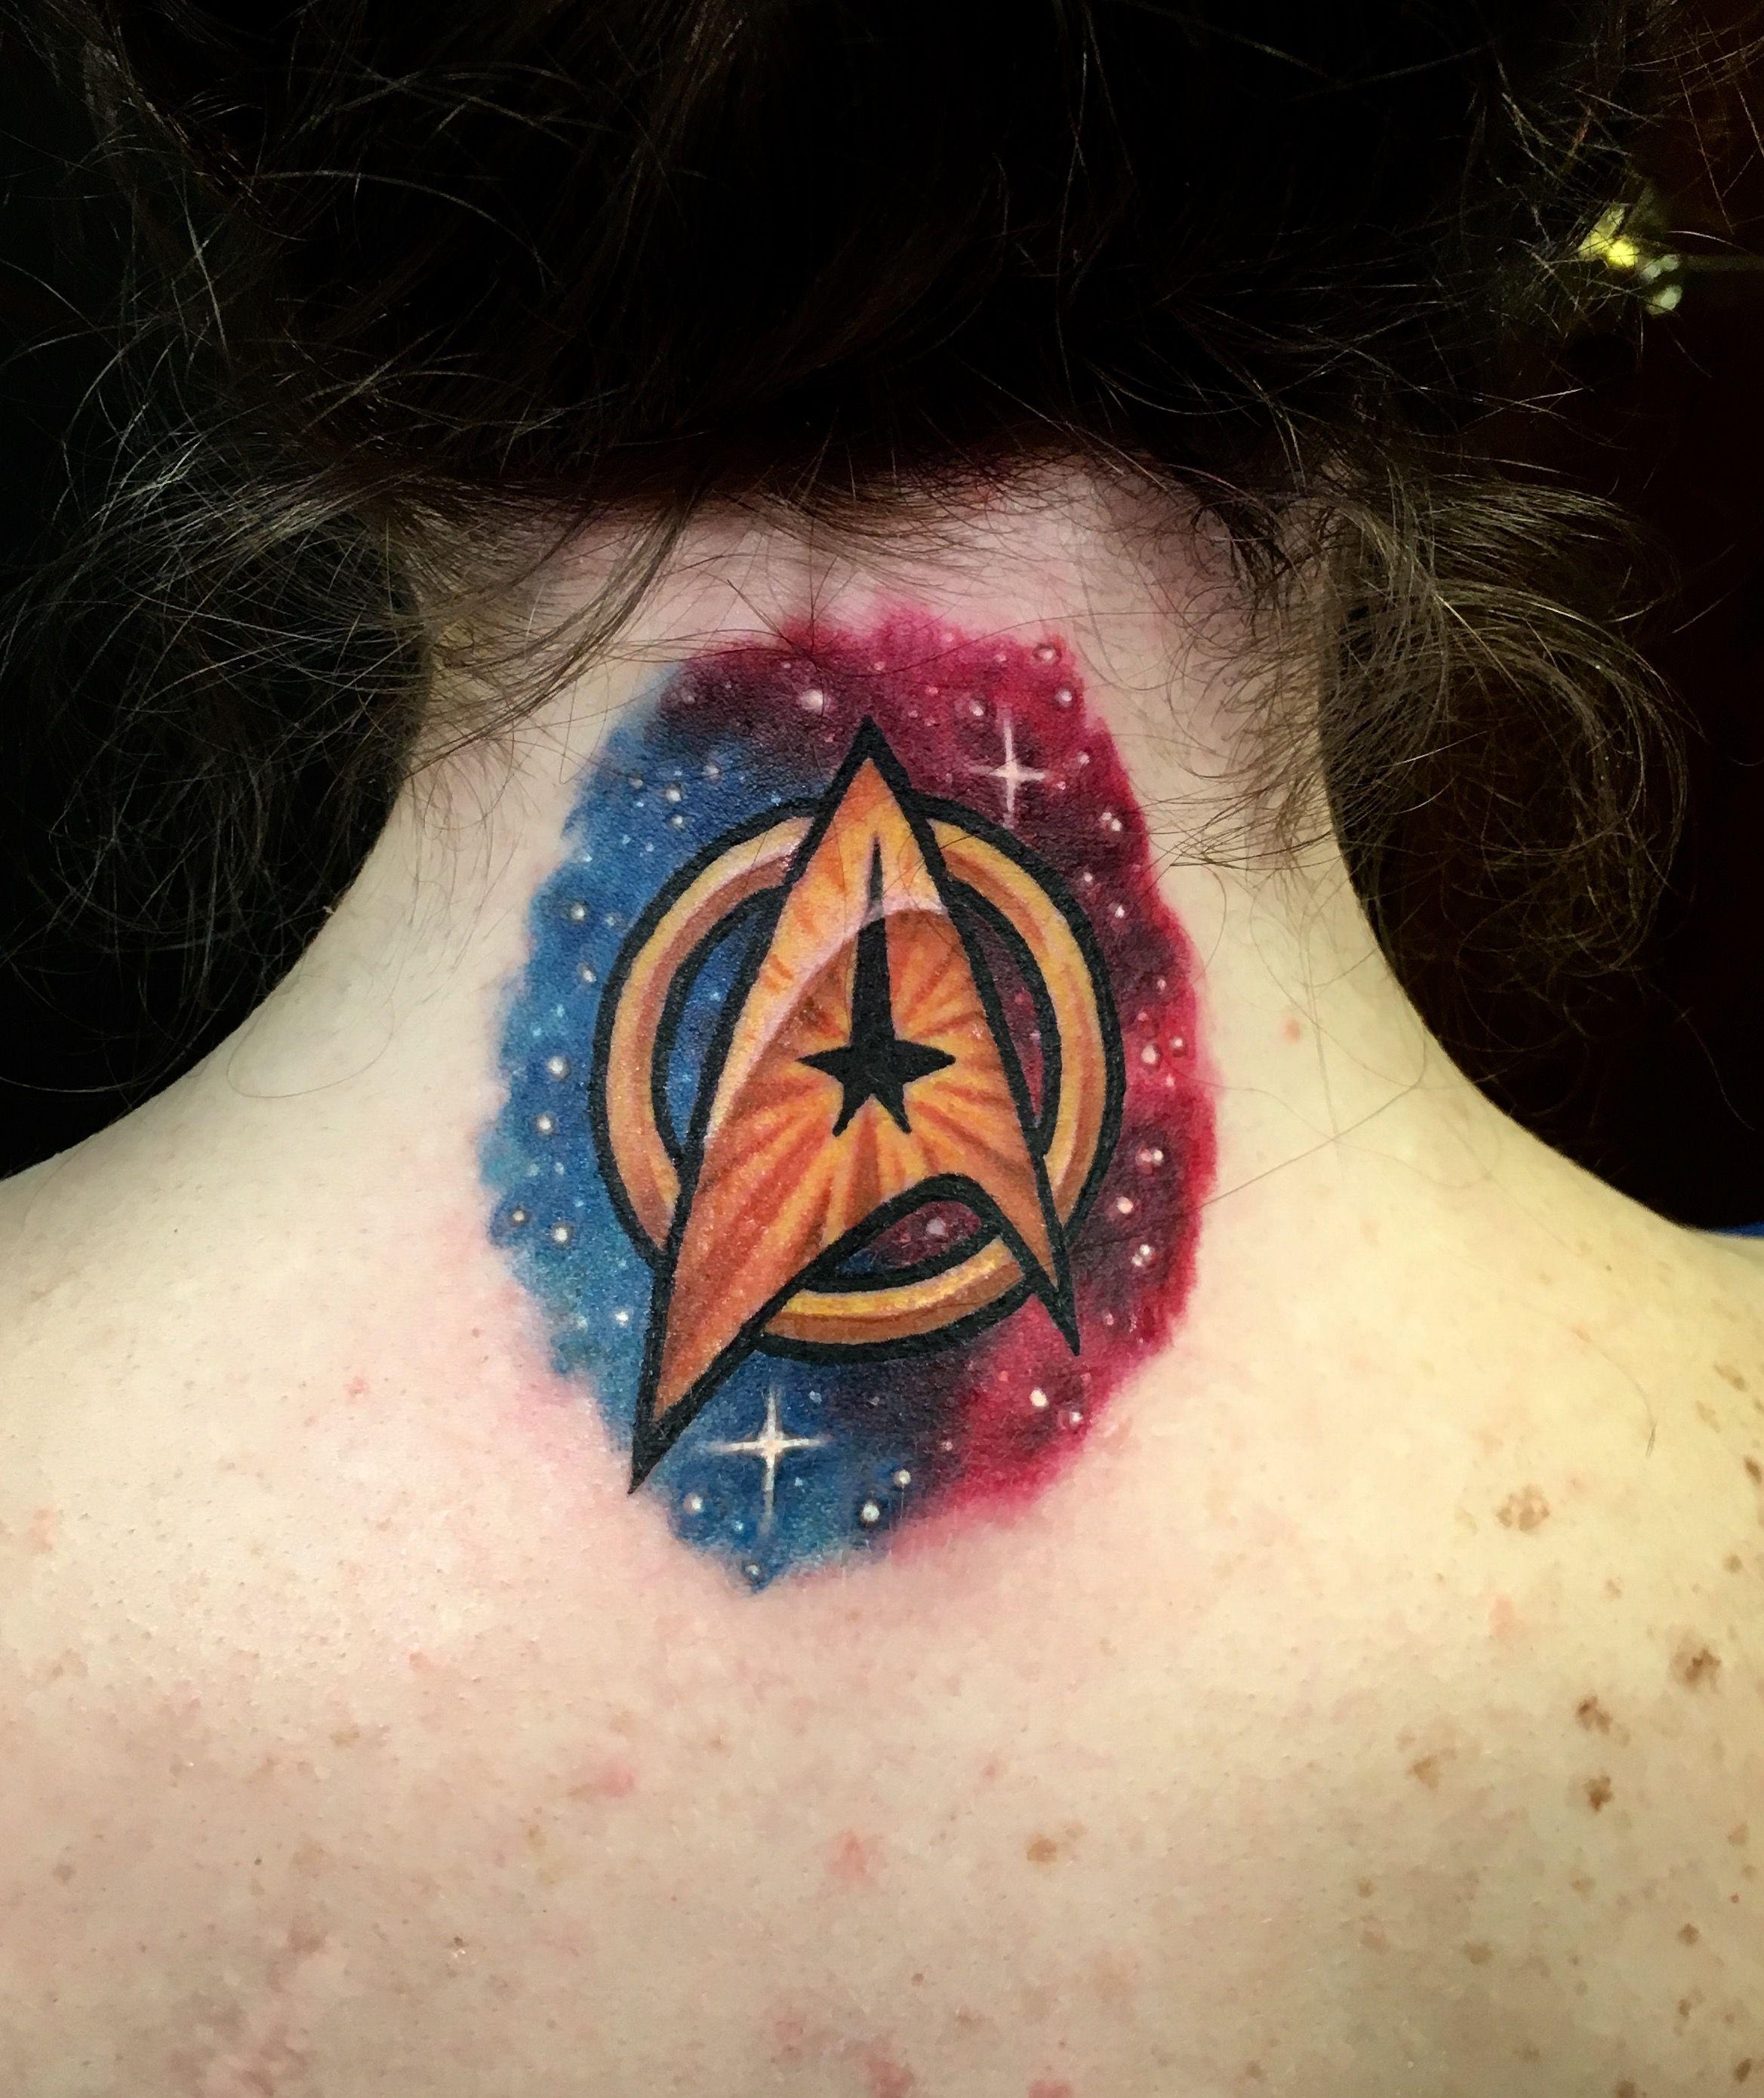 Immortal images steve huntsberry tattoos star trek space